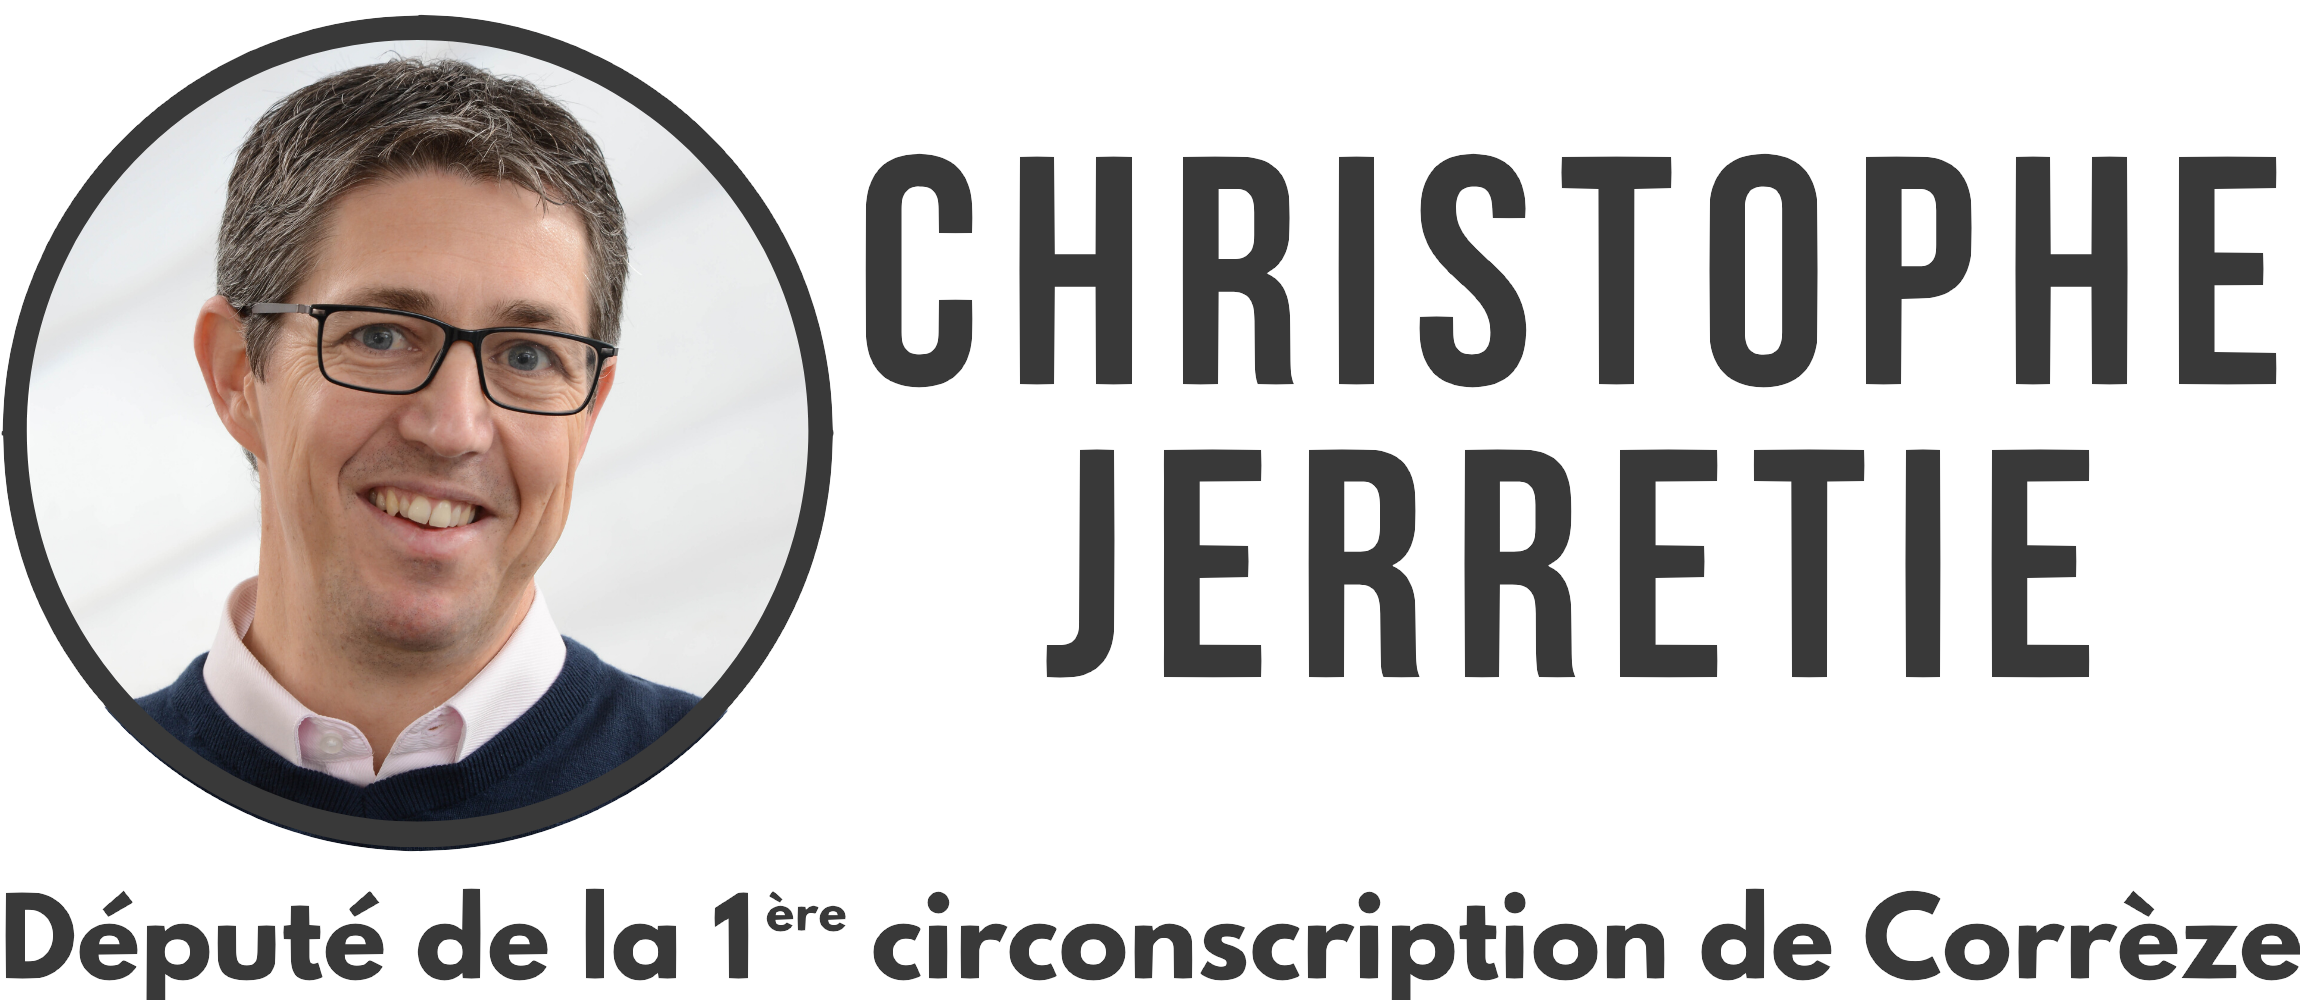 Christophe Jerretie